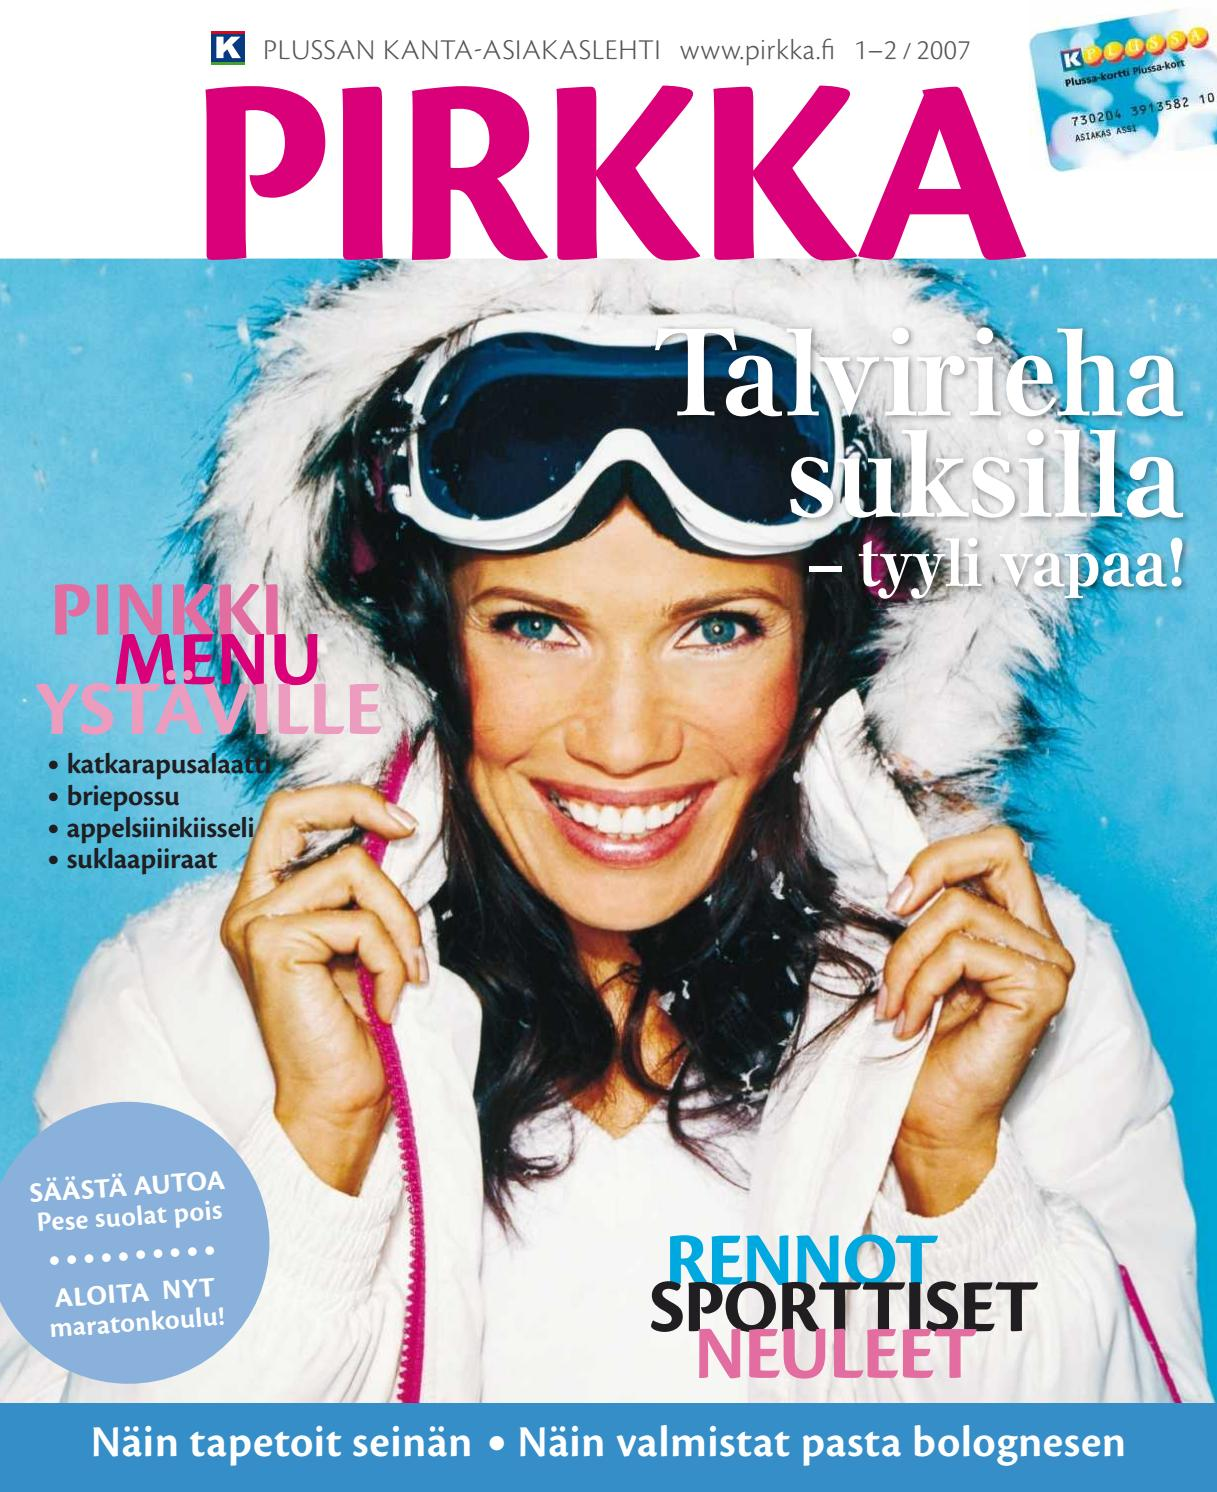 PIRKKA 1-2 2007 by Ruokakesko - issuu 721889f582